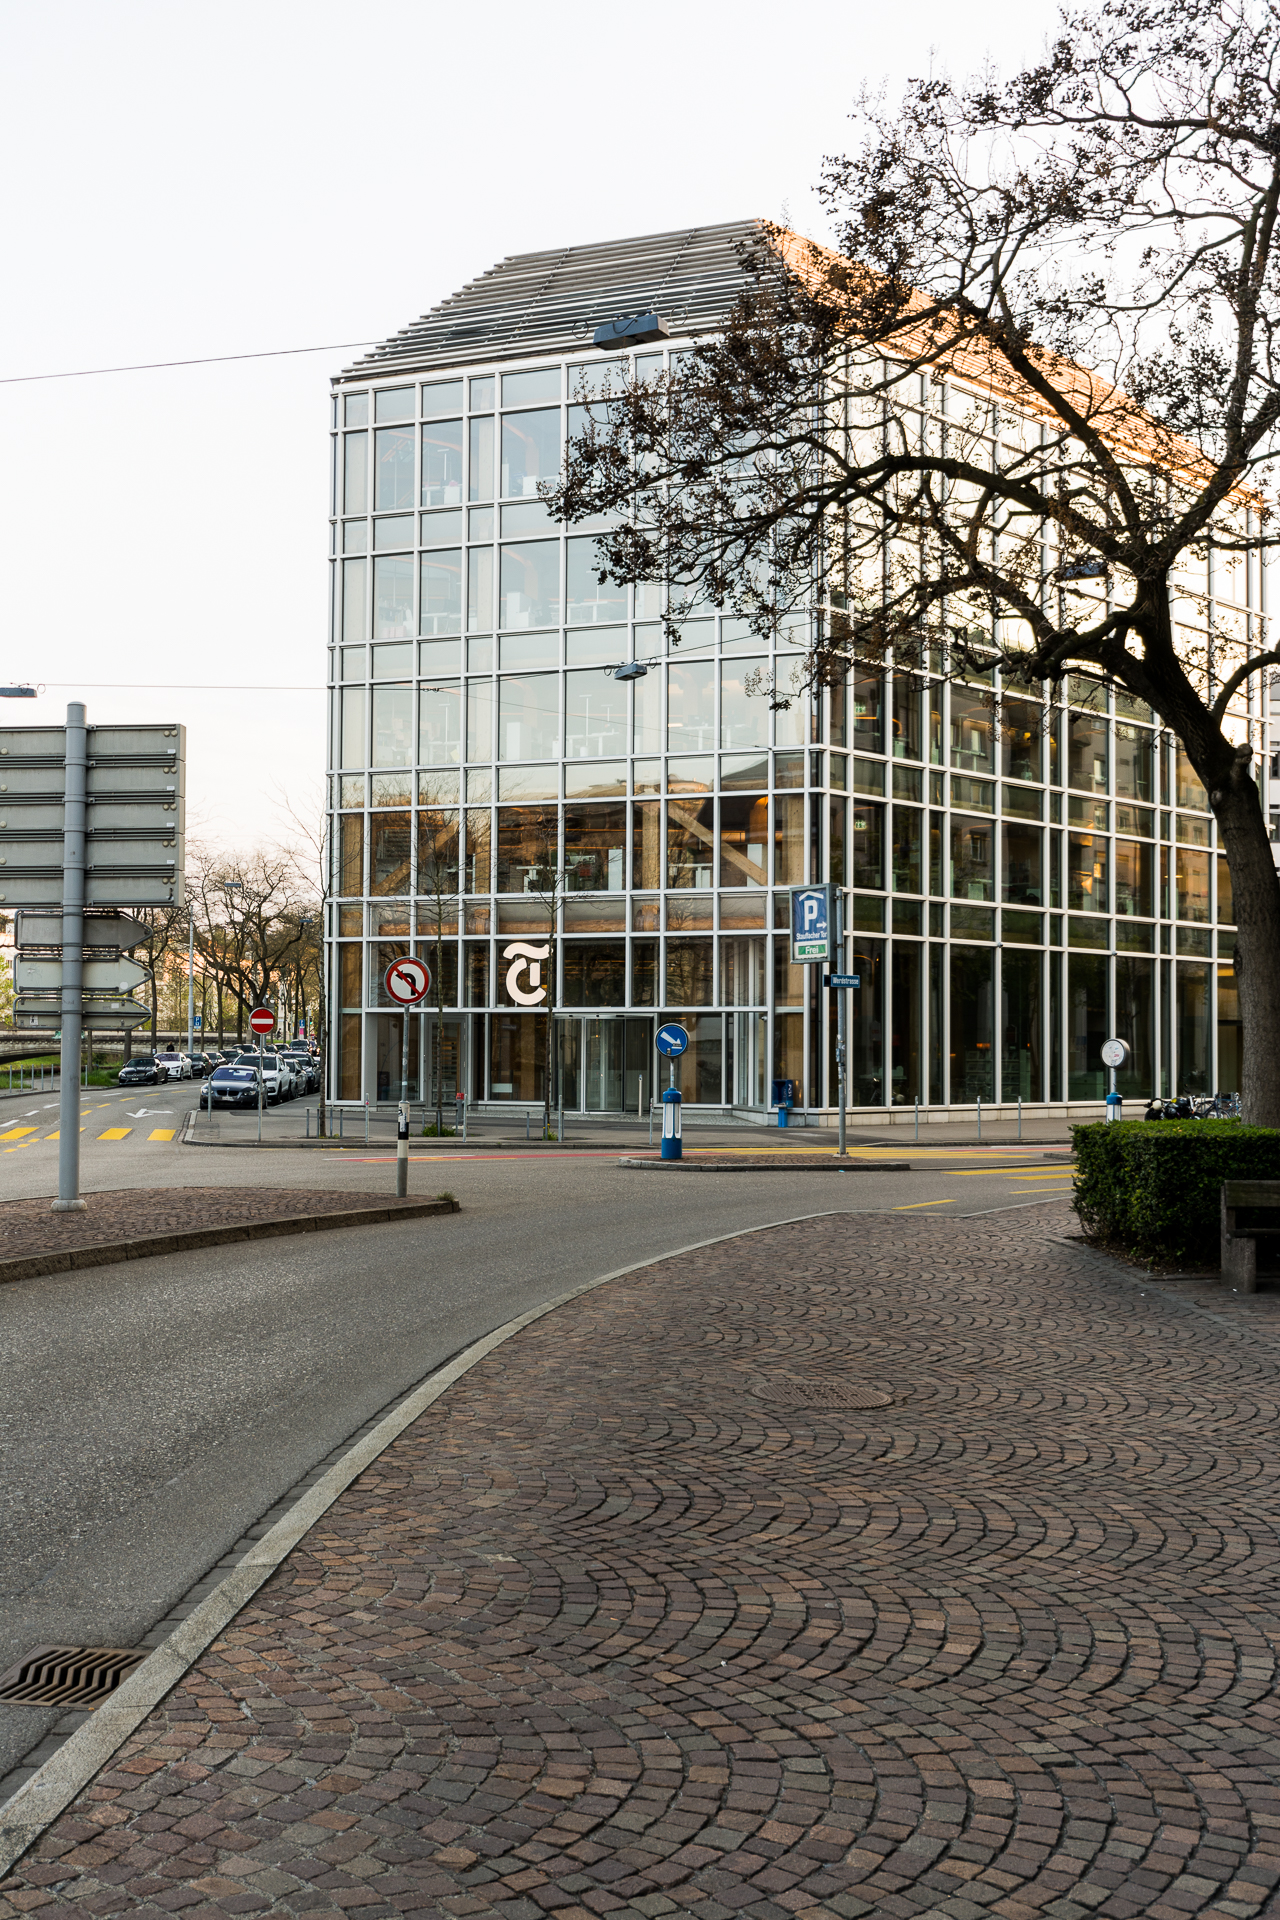 Sigeru Ban / Tamedia Office Building - Zürich